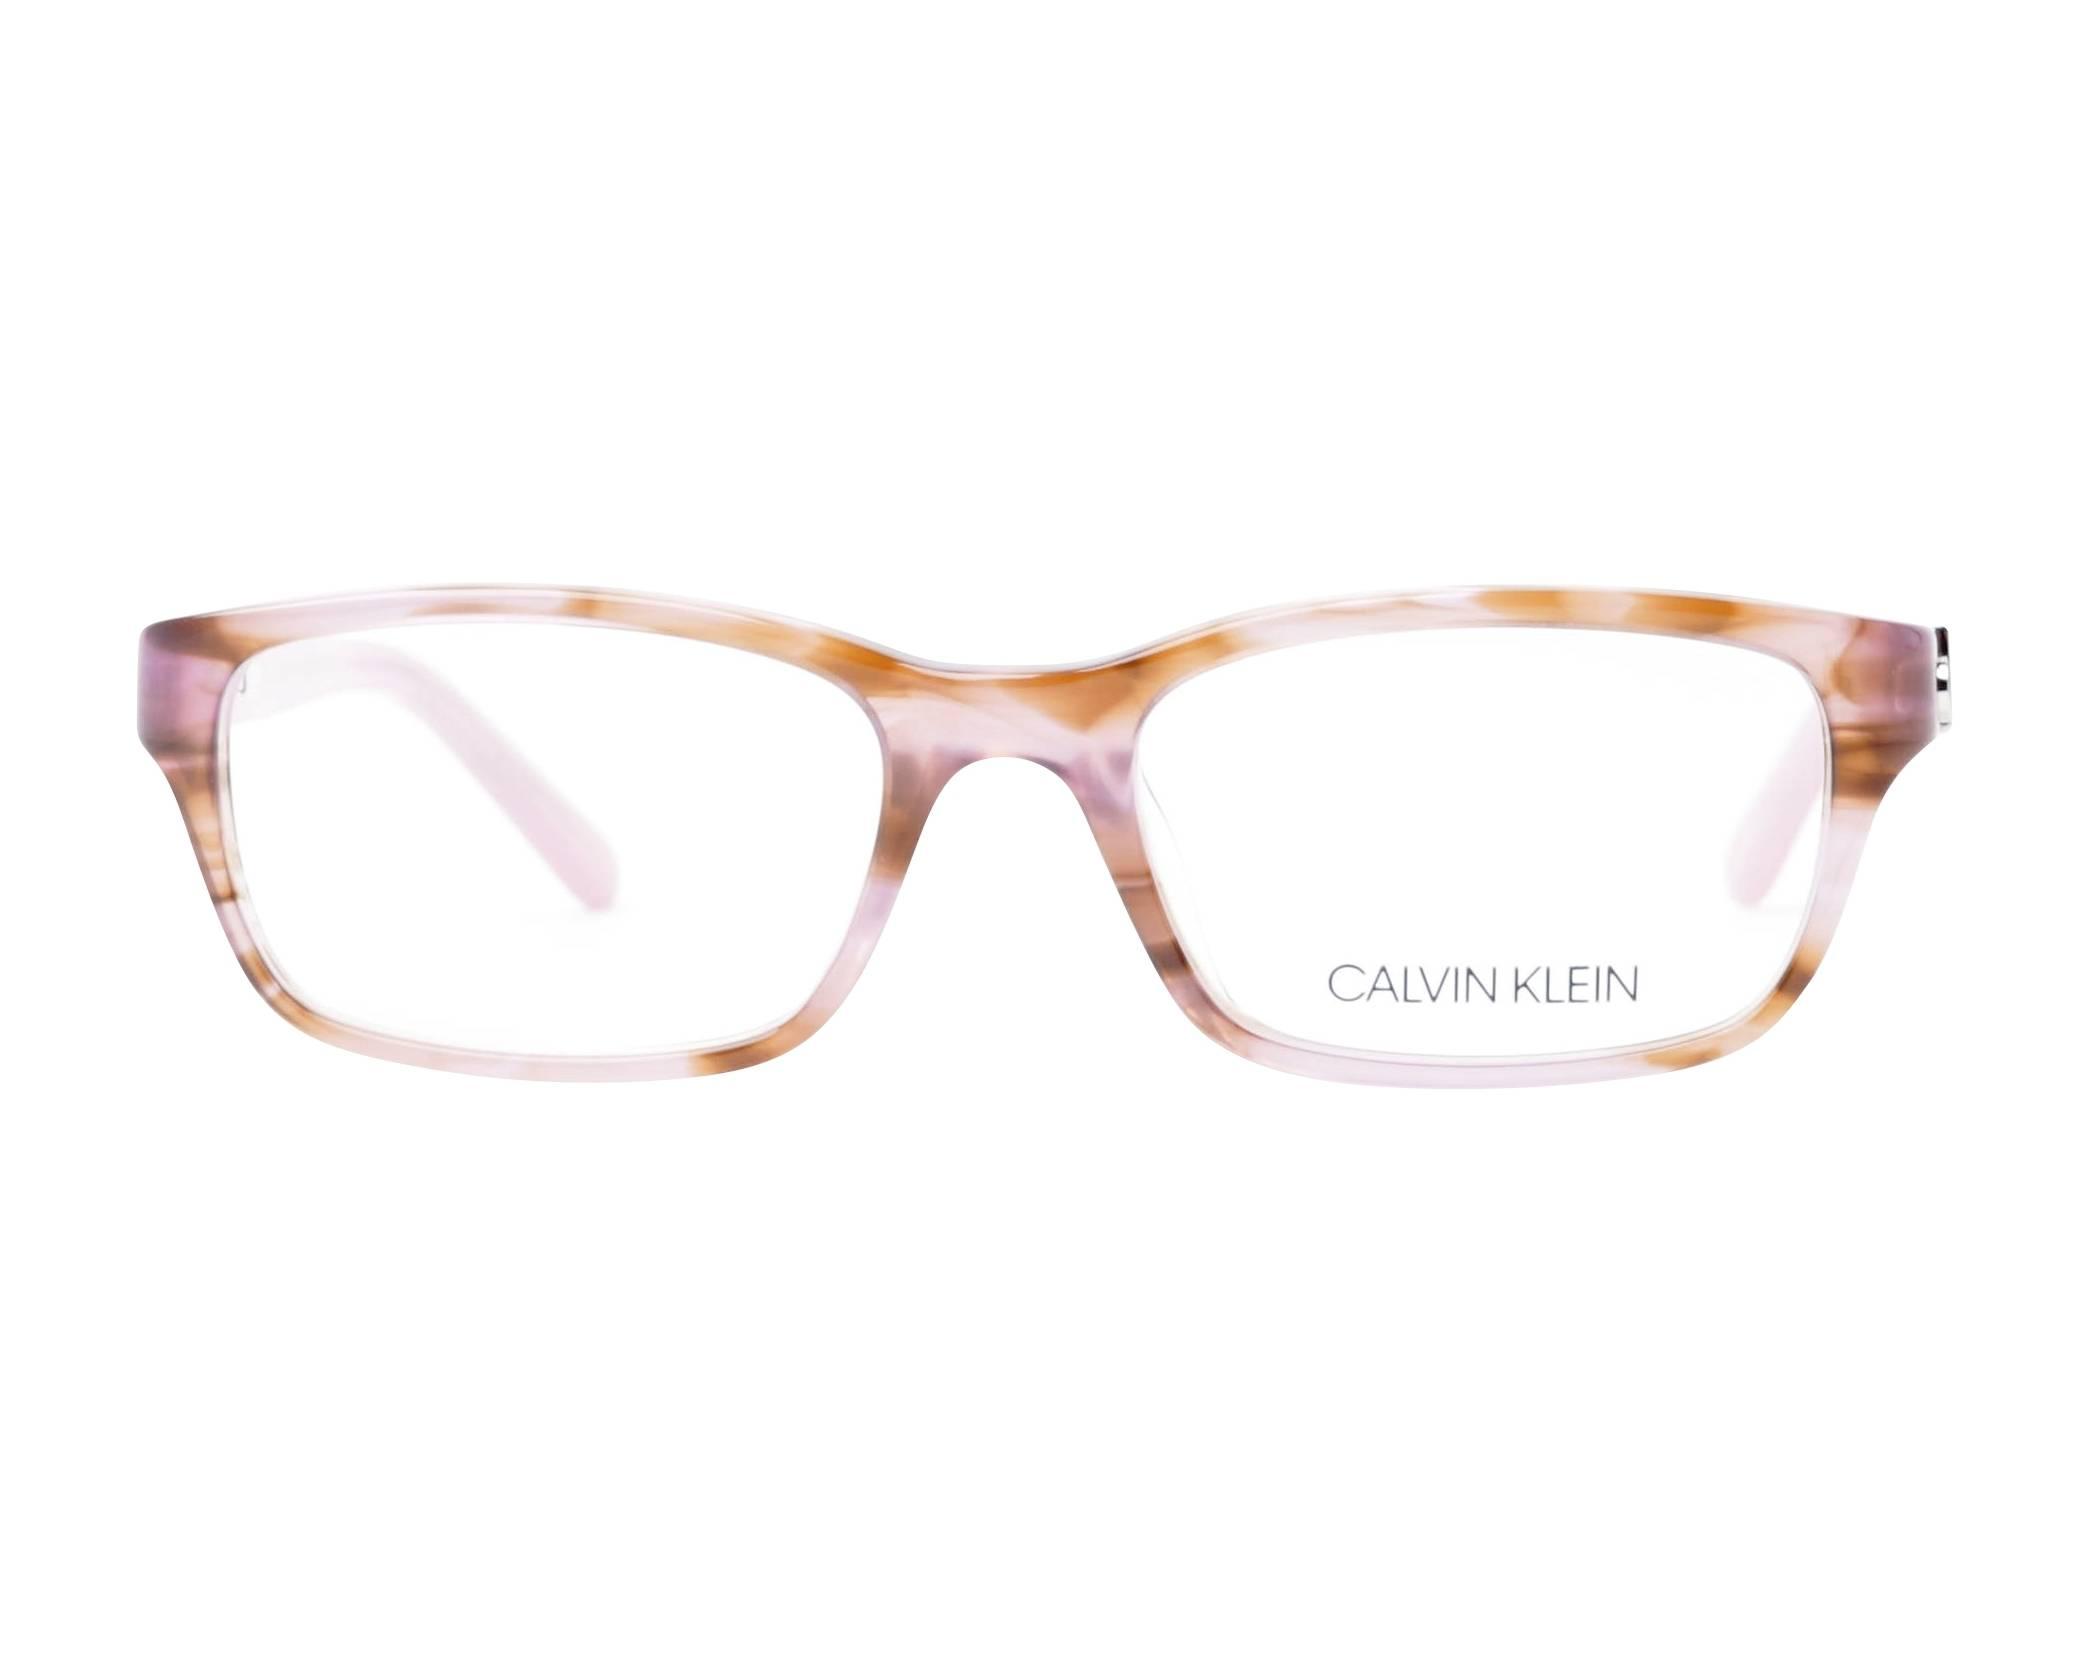 969b27f7f7 eyeglasses Calvin Klein CK-5691 608 50-17 Grey Violet front view